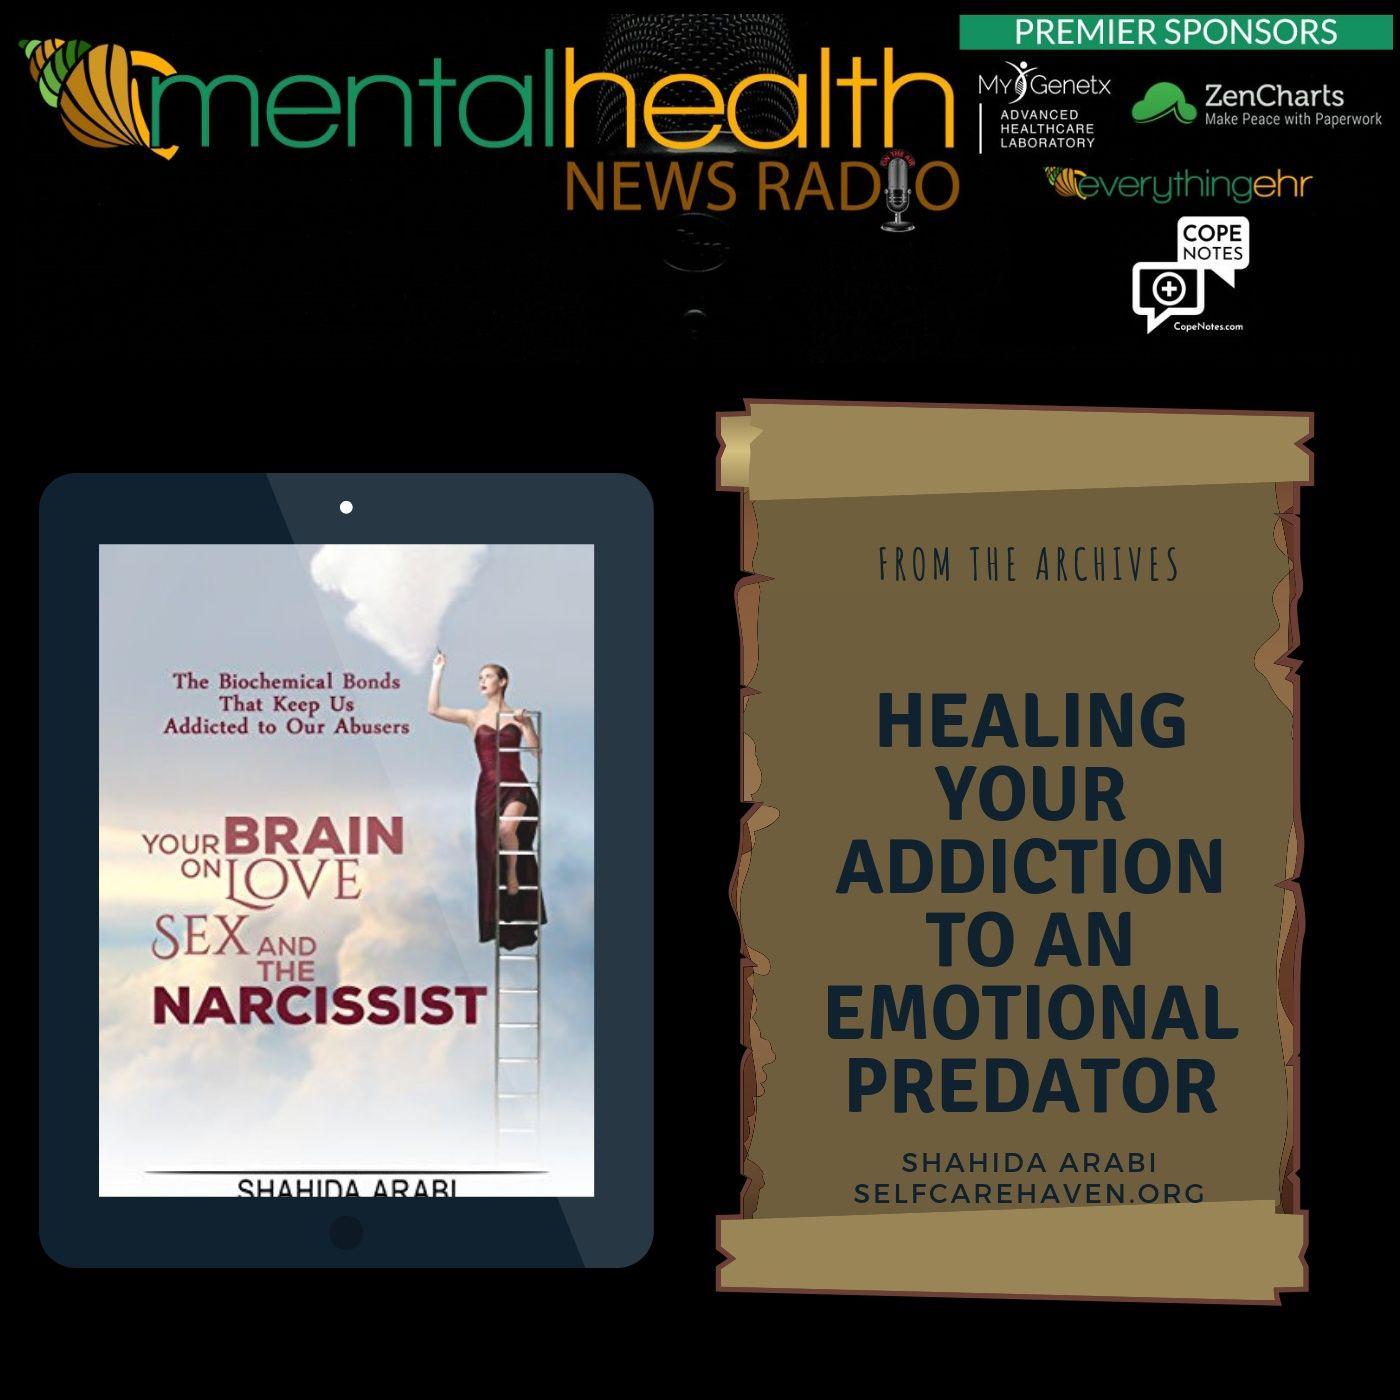 Mental Health News Radio - Healing Your Addiction to an Emotional Predator with Shahida Arabi